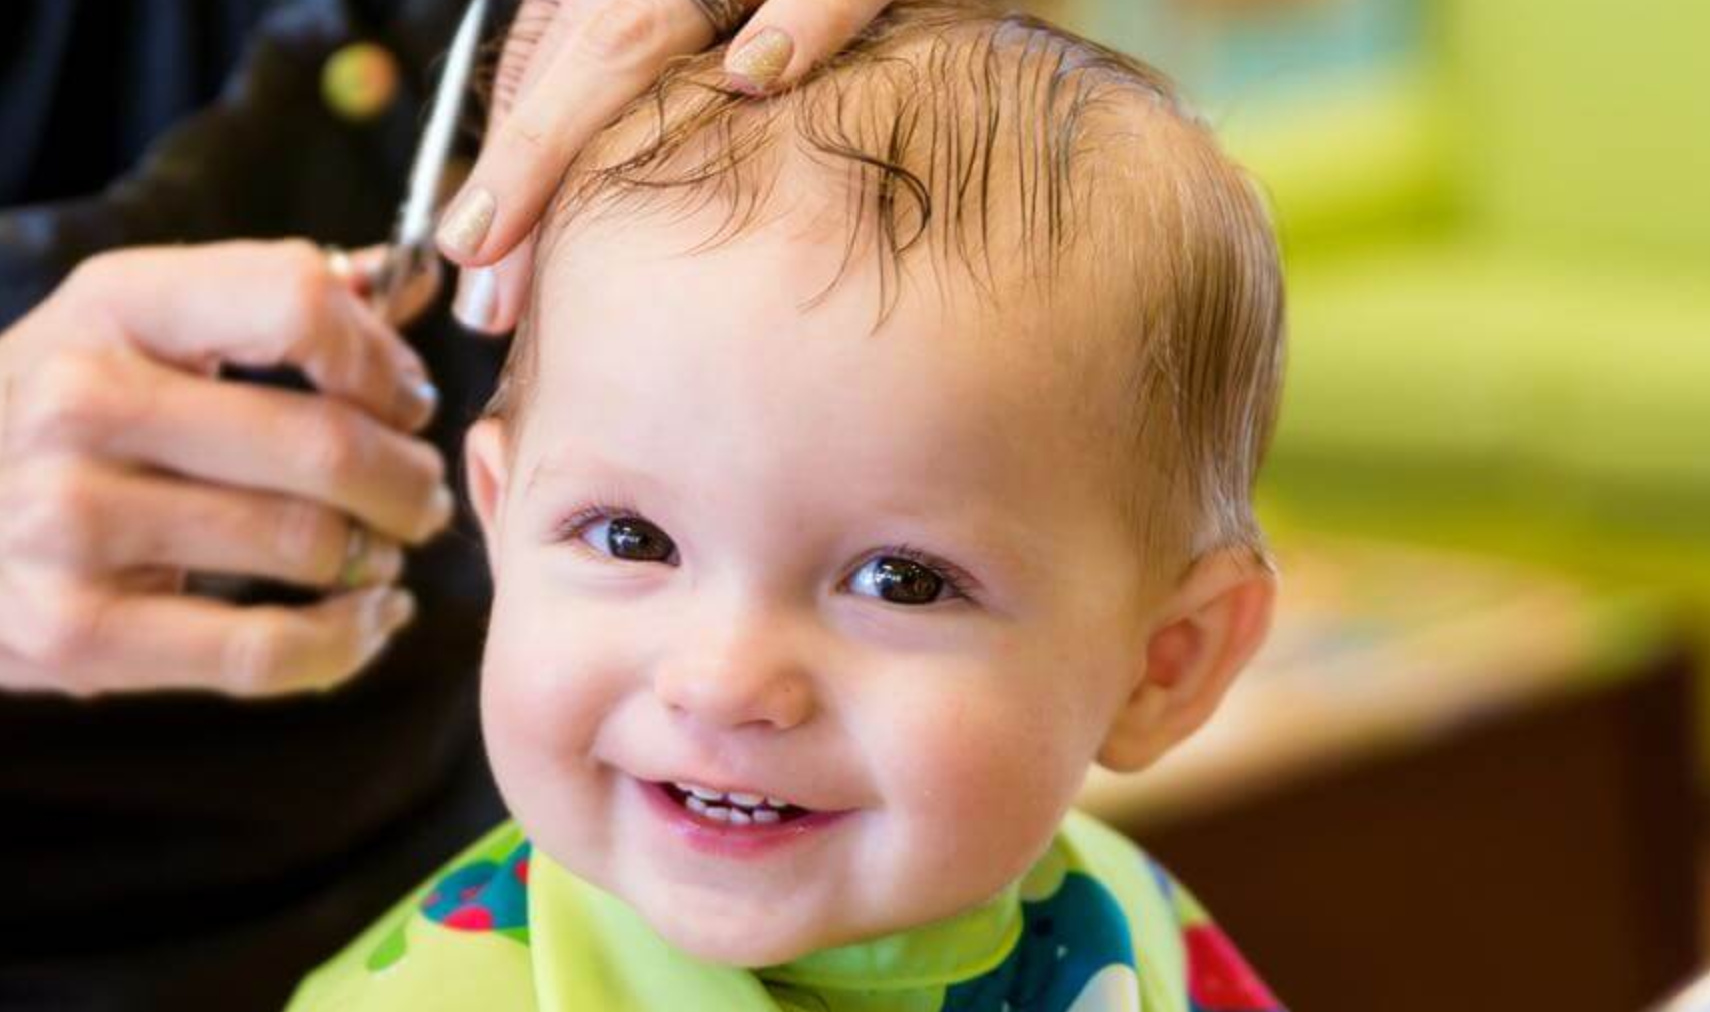 Turnkey, Award-winning Children's Hair Salon